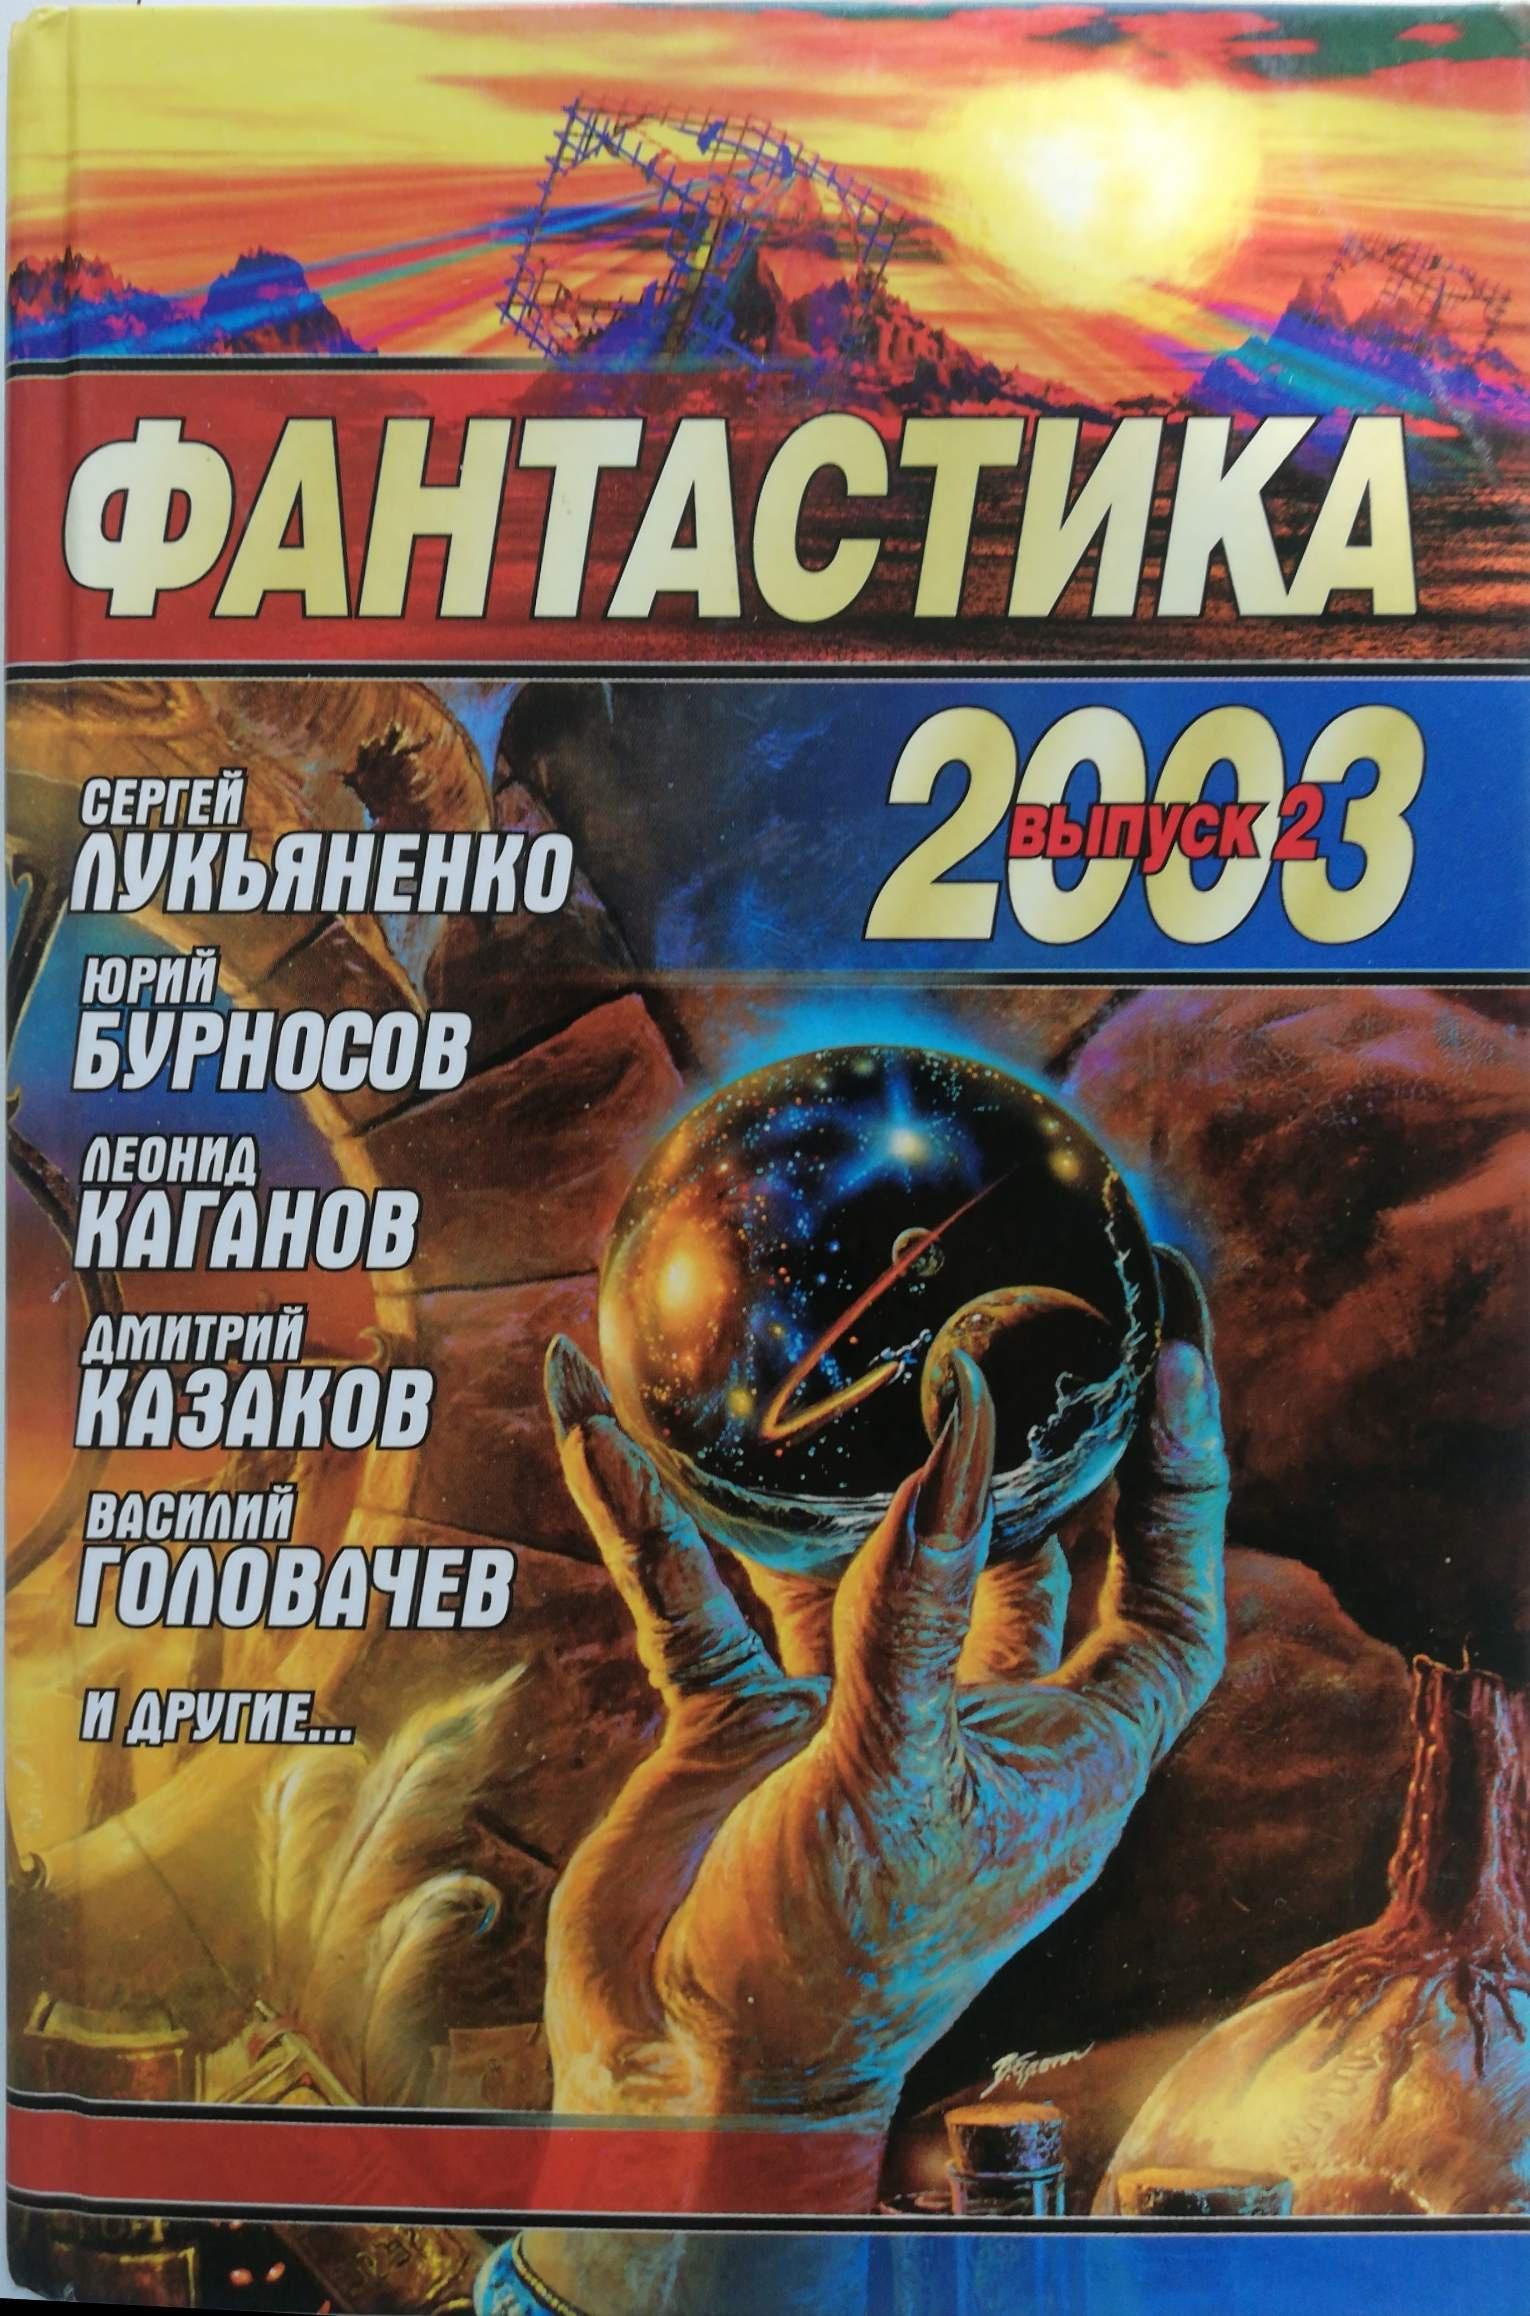 Чекмаев,Синицын,Рогач,Аренев,Бурносов Фантастика 2003. Выпуск 2